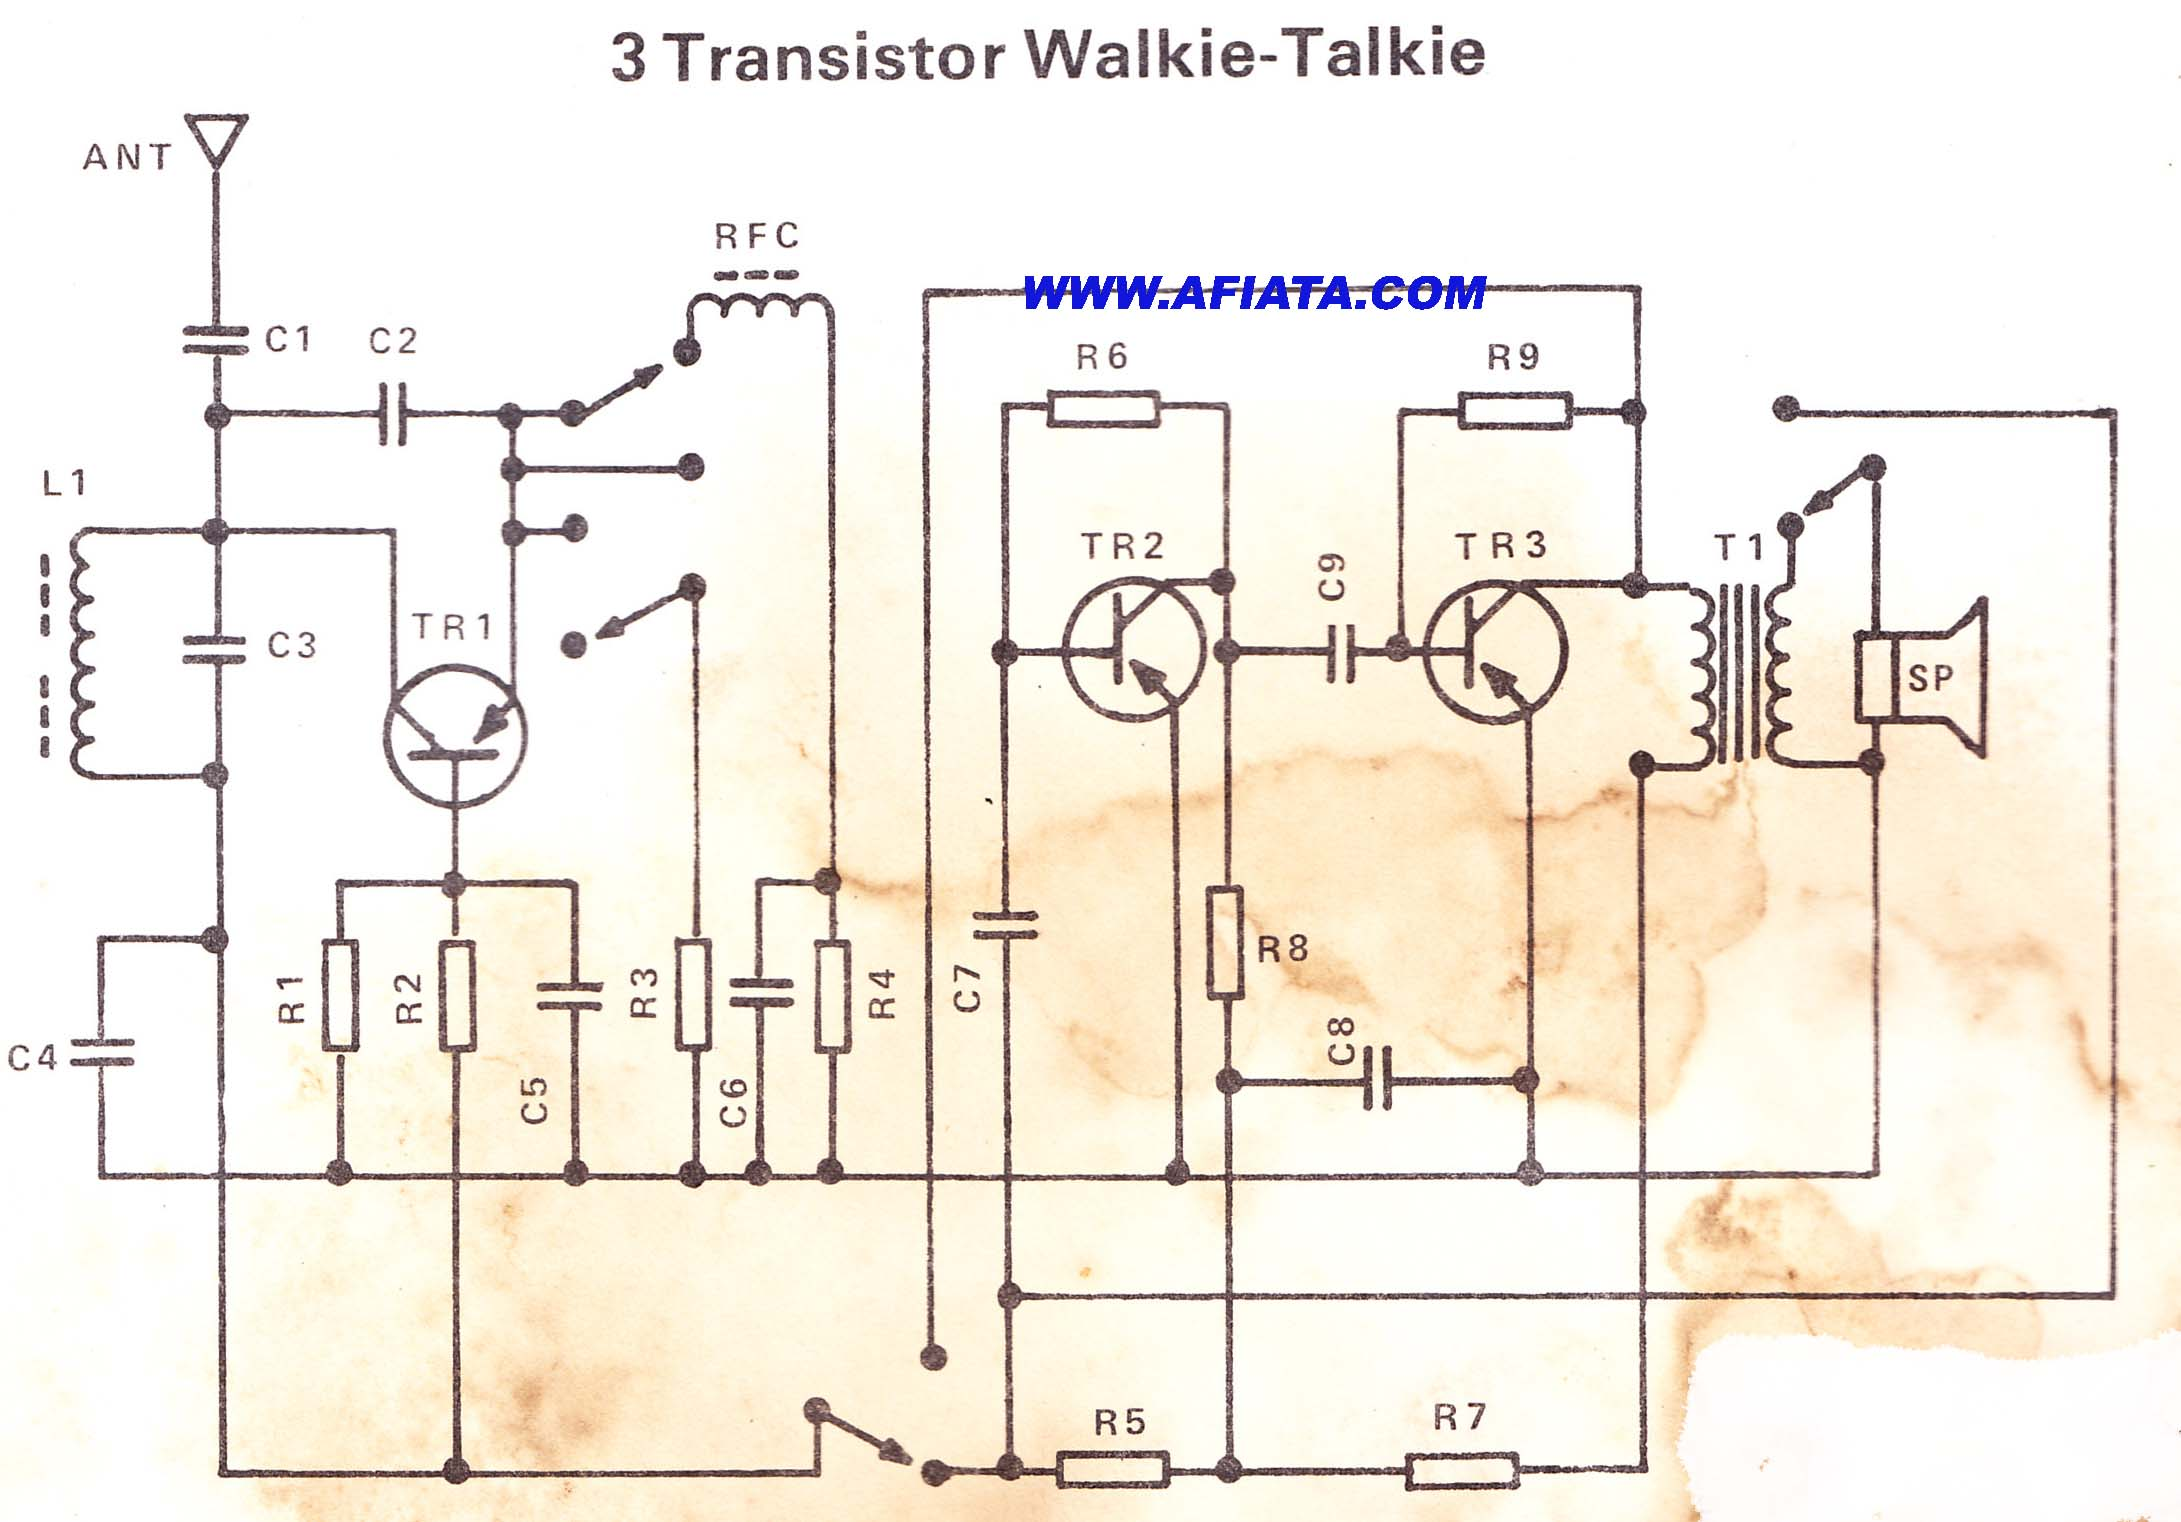 Circuit Walkie Talkie Complete Both – Fondos de Pantalla on